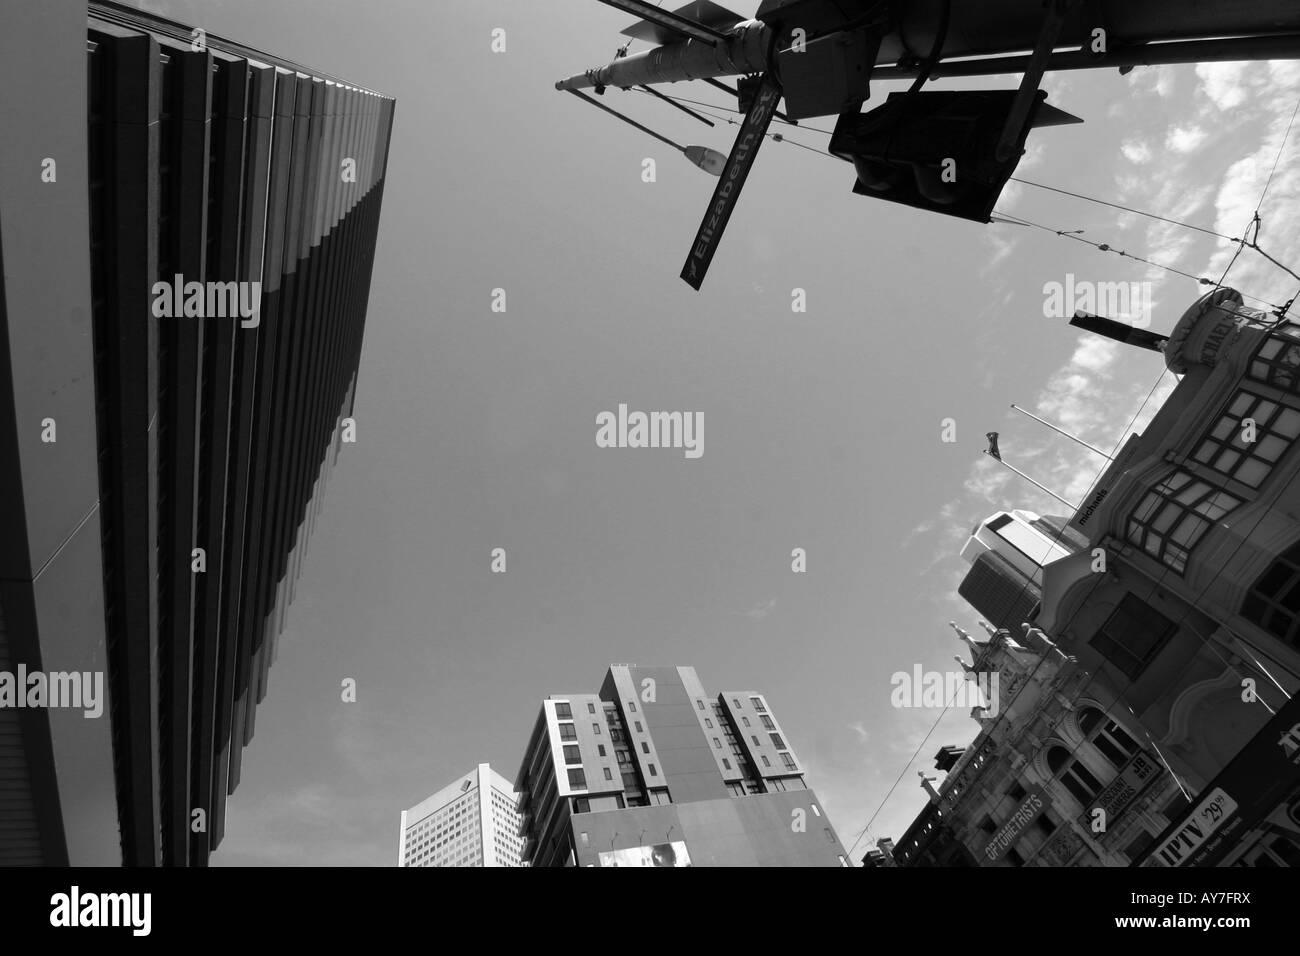 Melbourne city - Stock Image